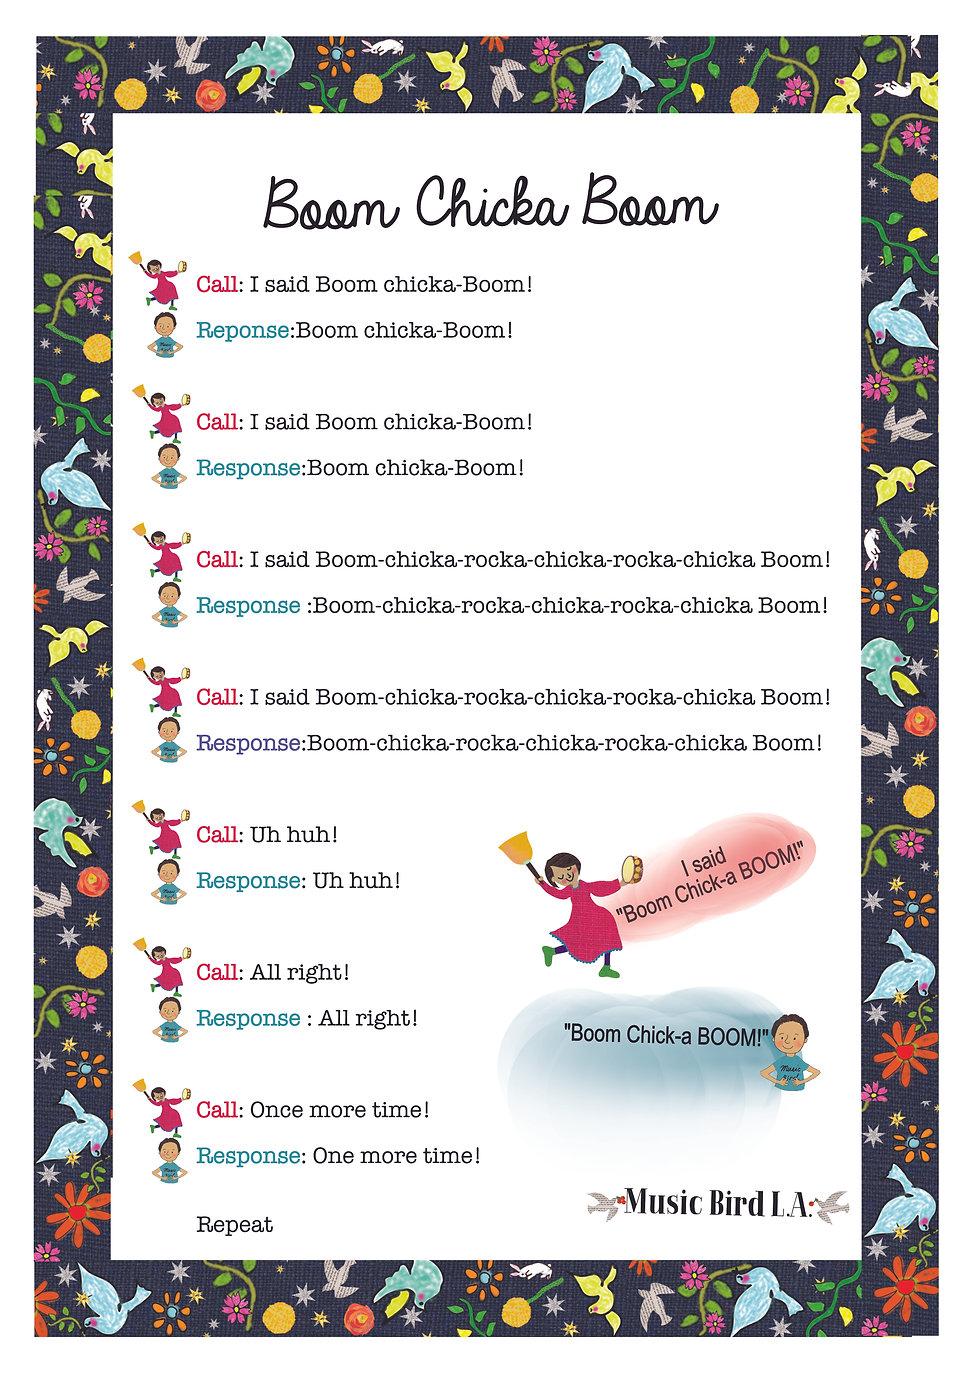 Boom Chicka Boom Lyrics.jpg